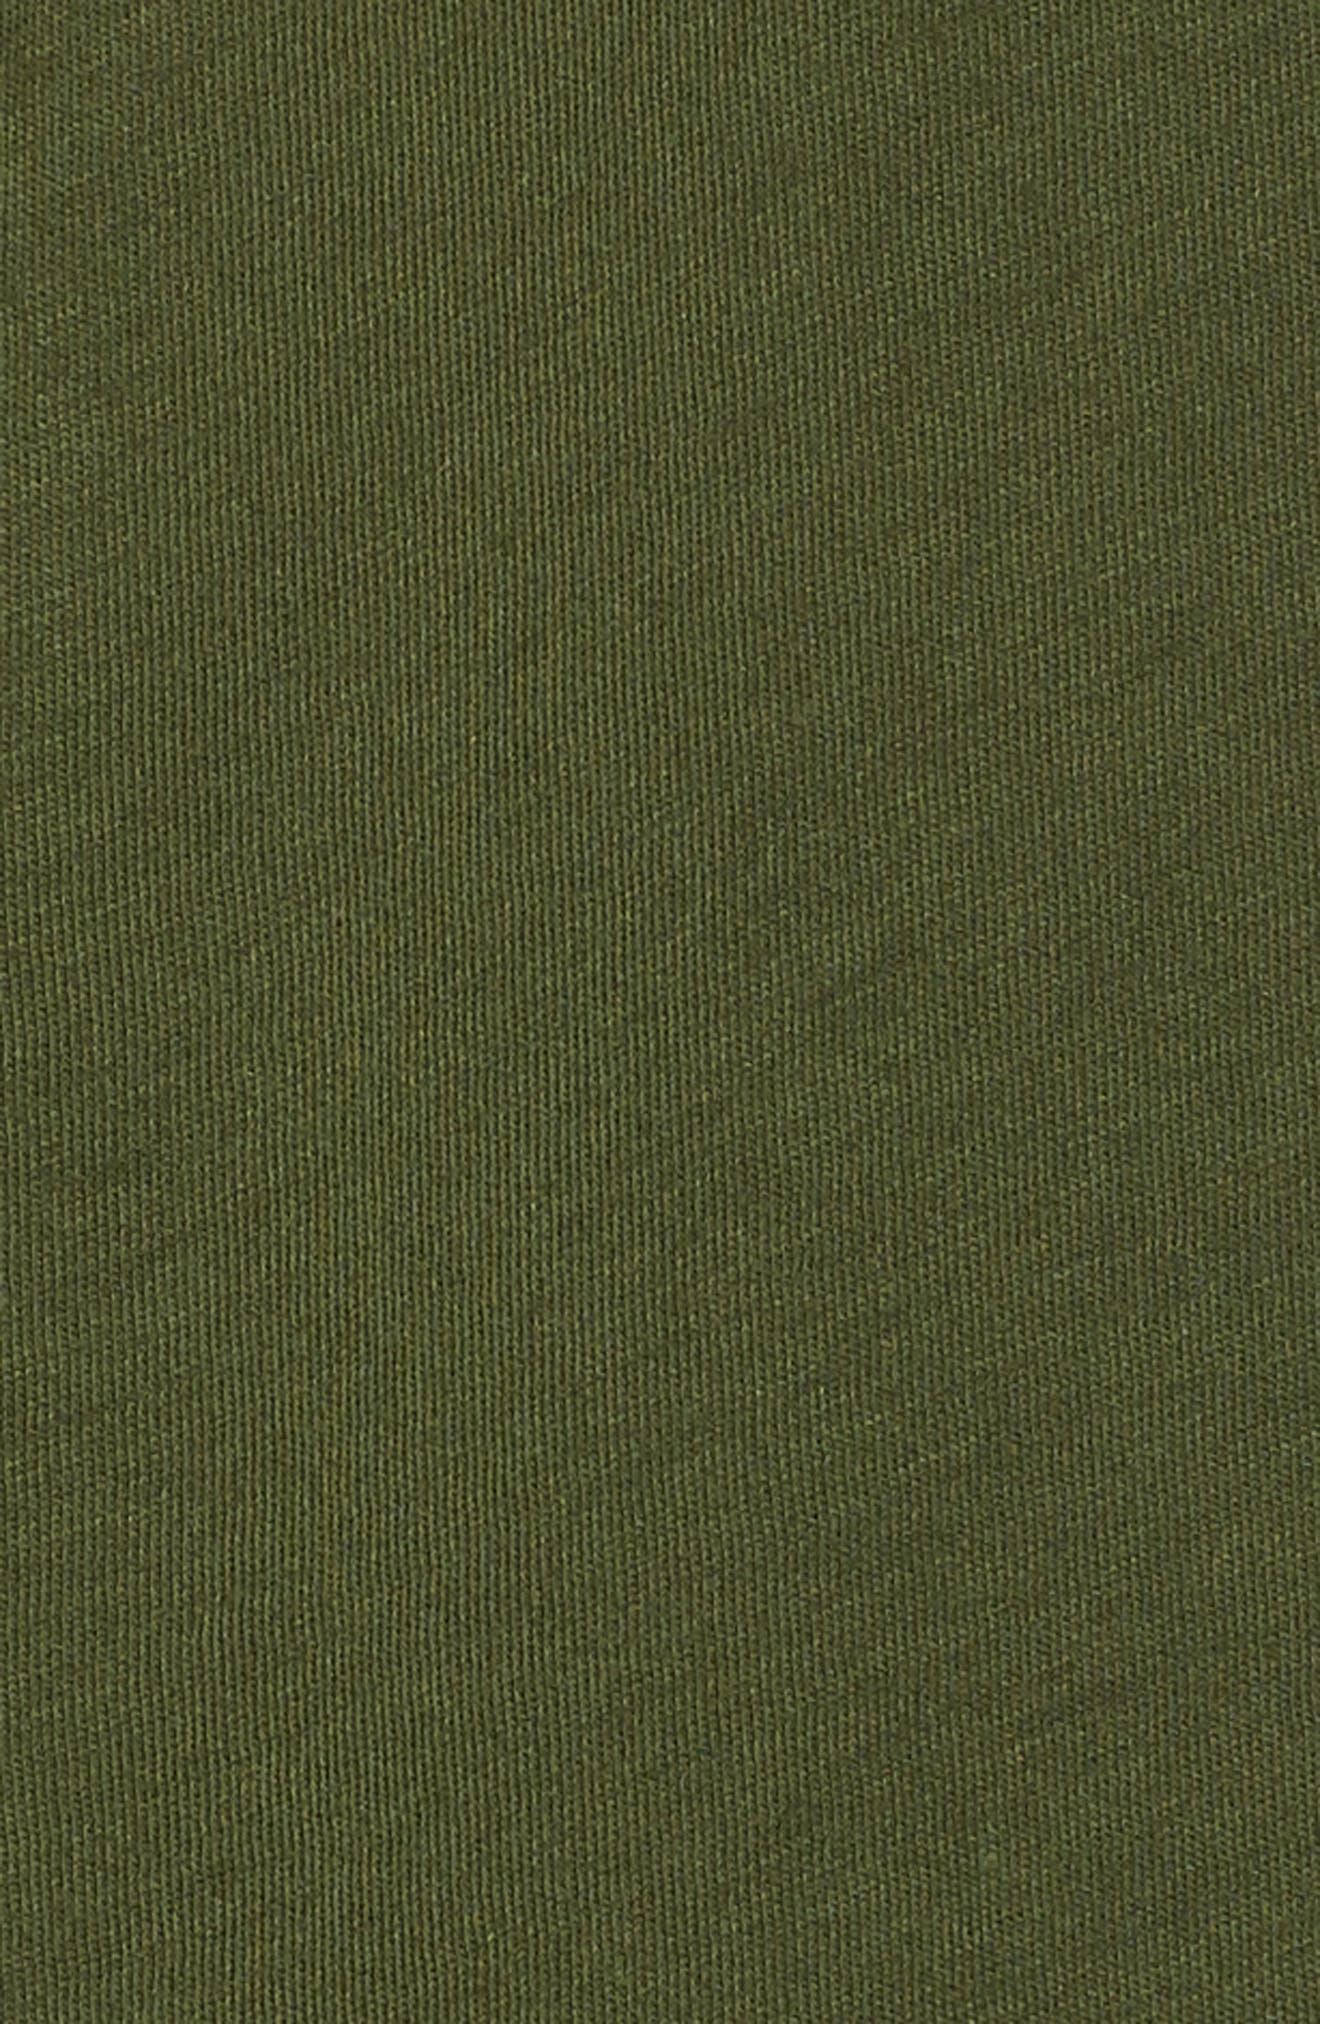 Super Slick Pullover,                             Alternate thumbnail 20, color,